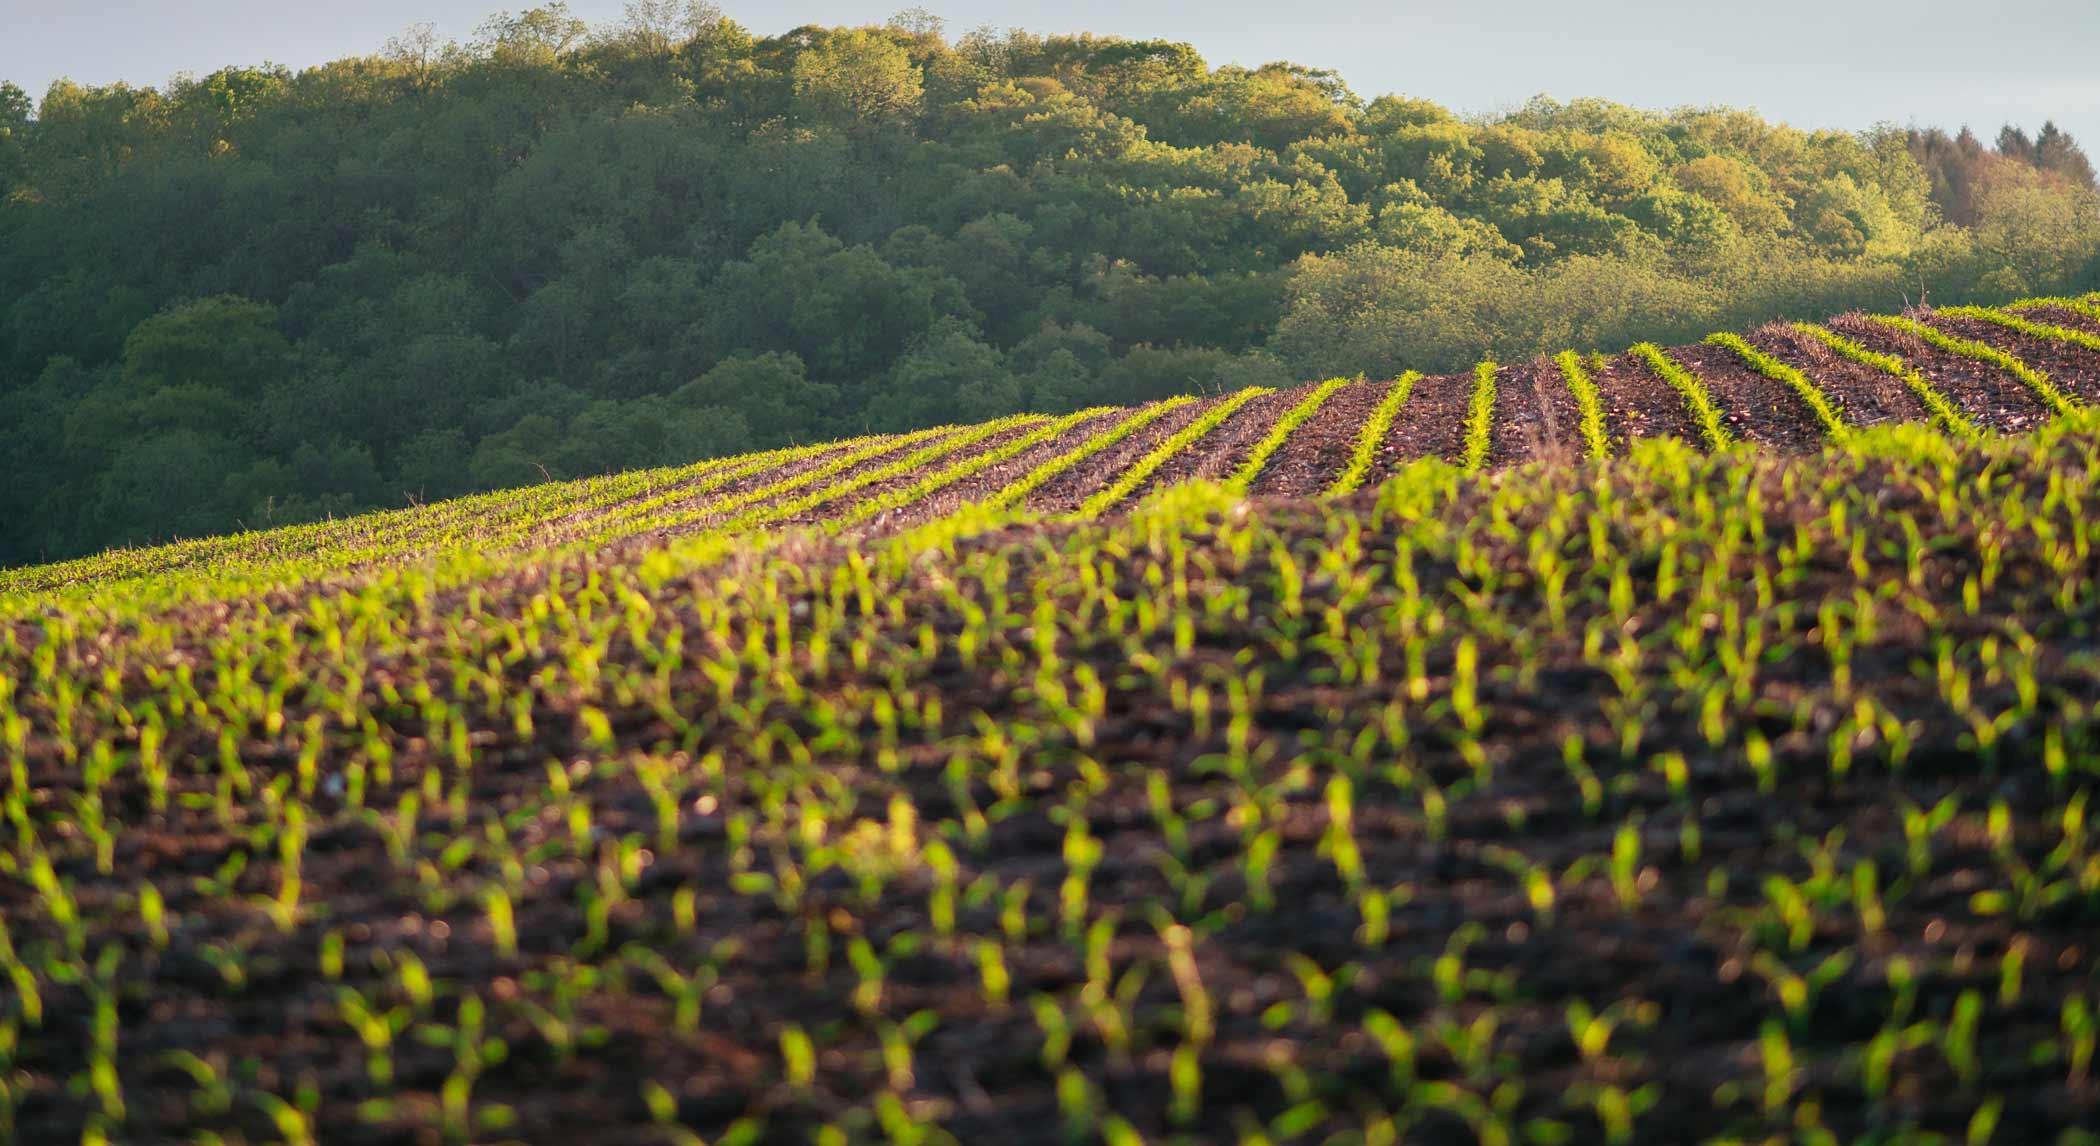 Midwest field